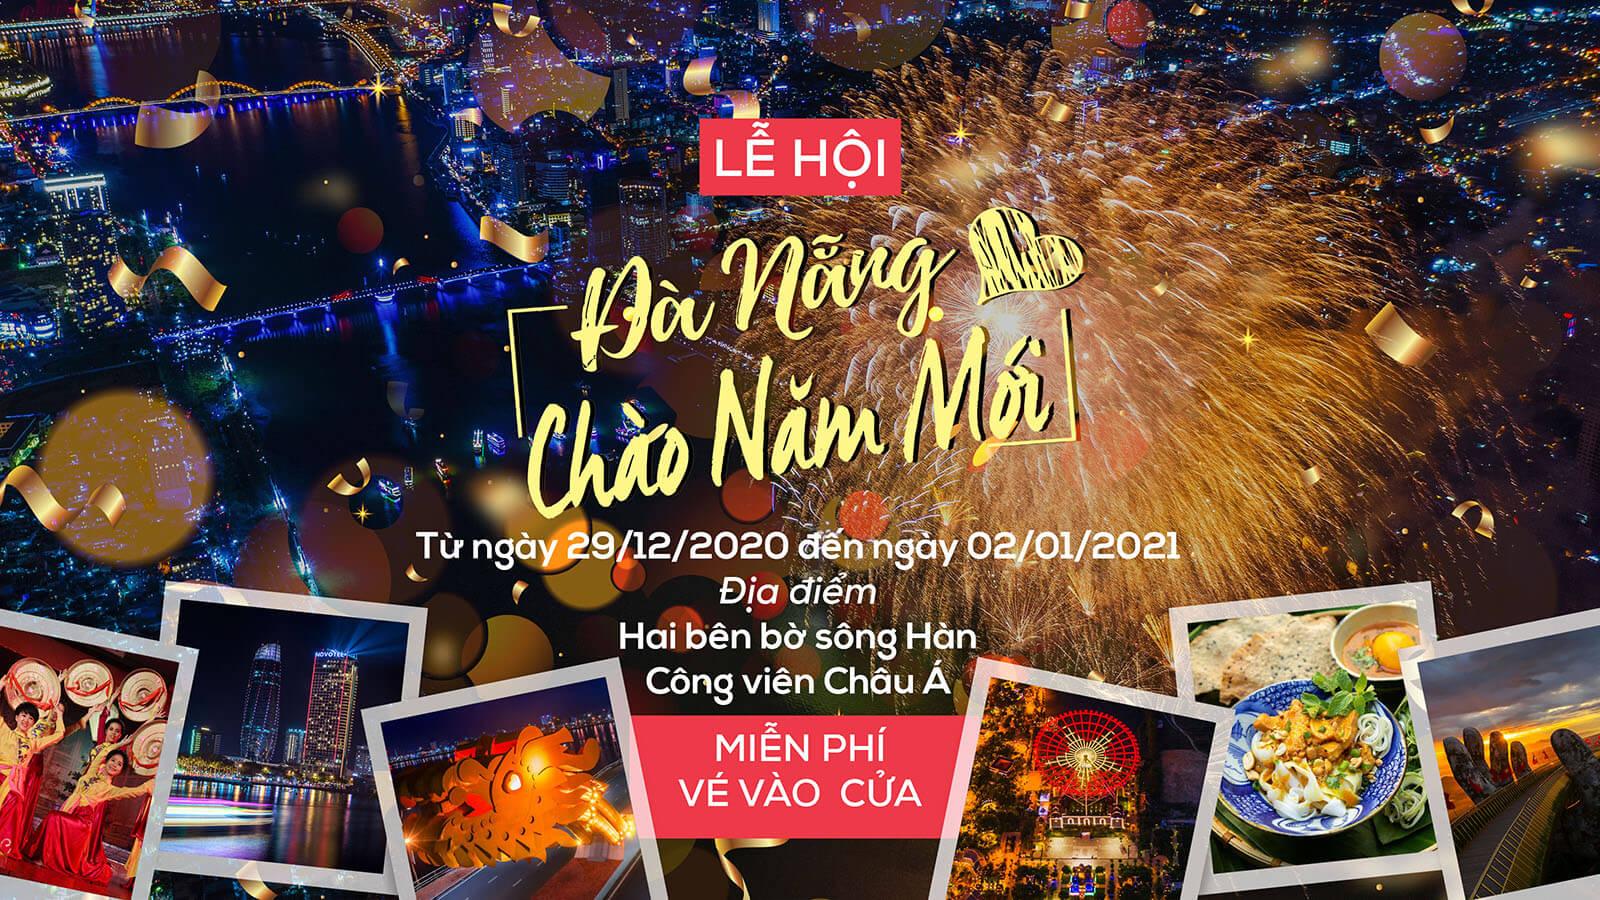 Le Hoi Da Nang Chao Nam Moi 2021